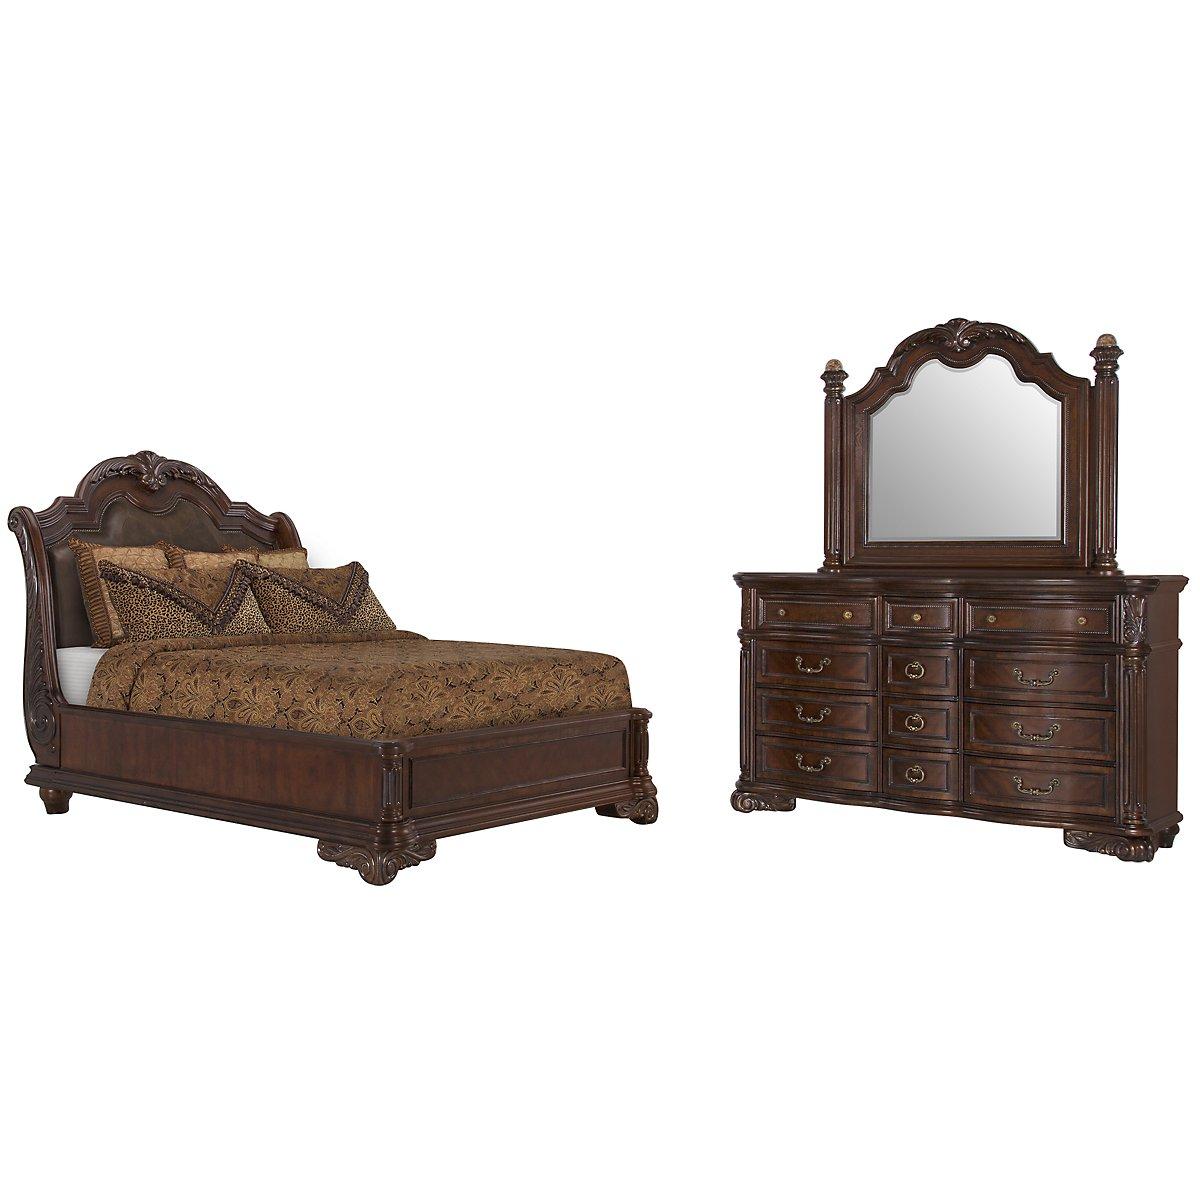 City Furniture Regal Dark Tone Leather Platform Bed